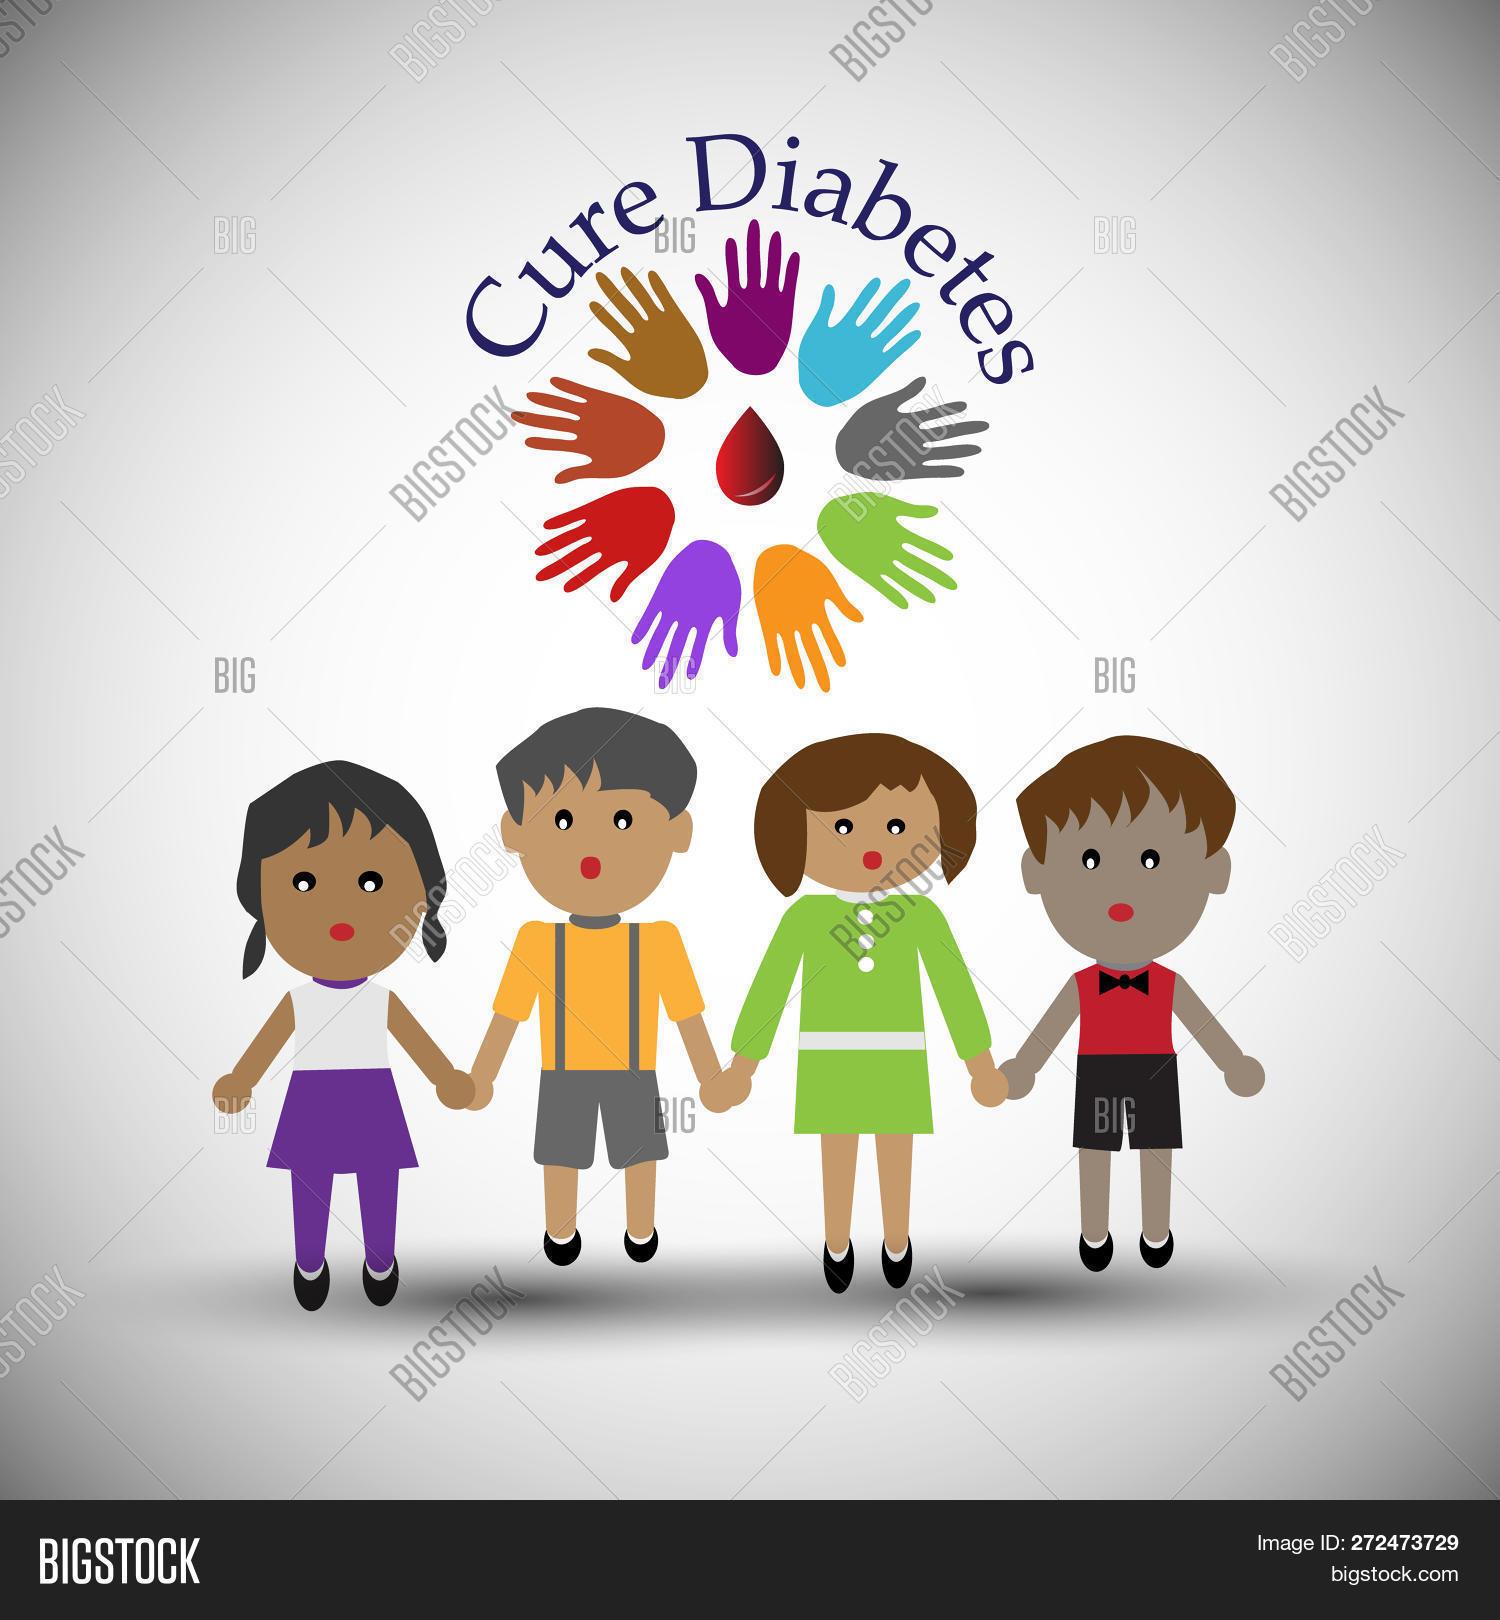 imágenes diabetes mellitus tipo 1